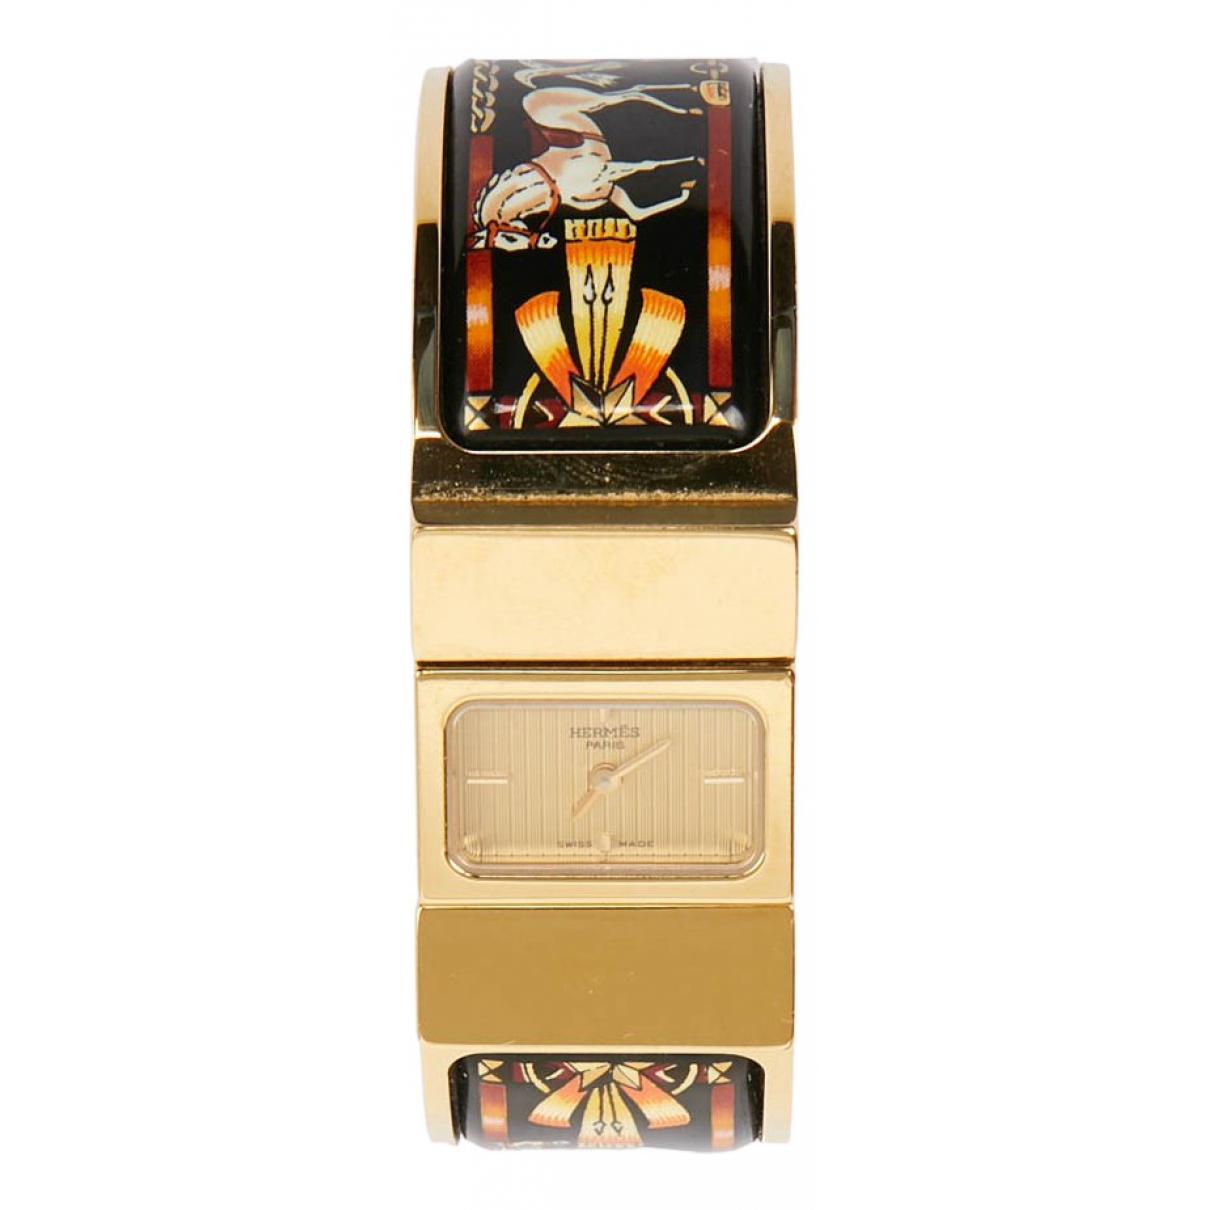 Hermes Loquet Uhr in  Schwarz Vergoldet